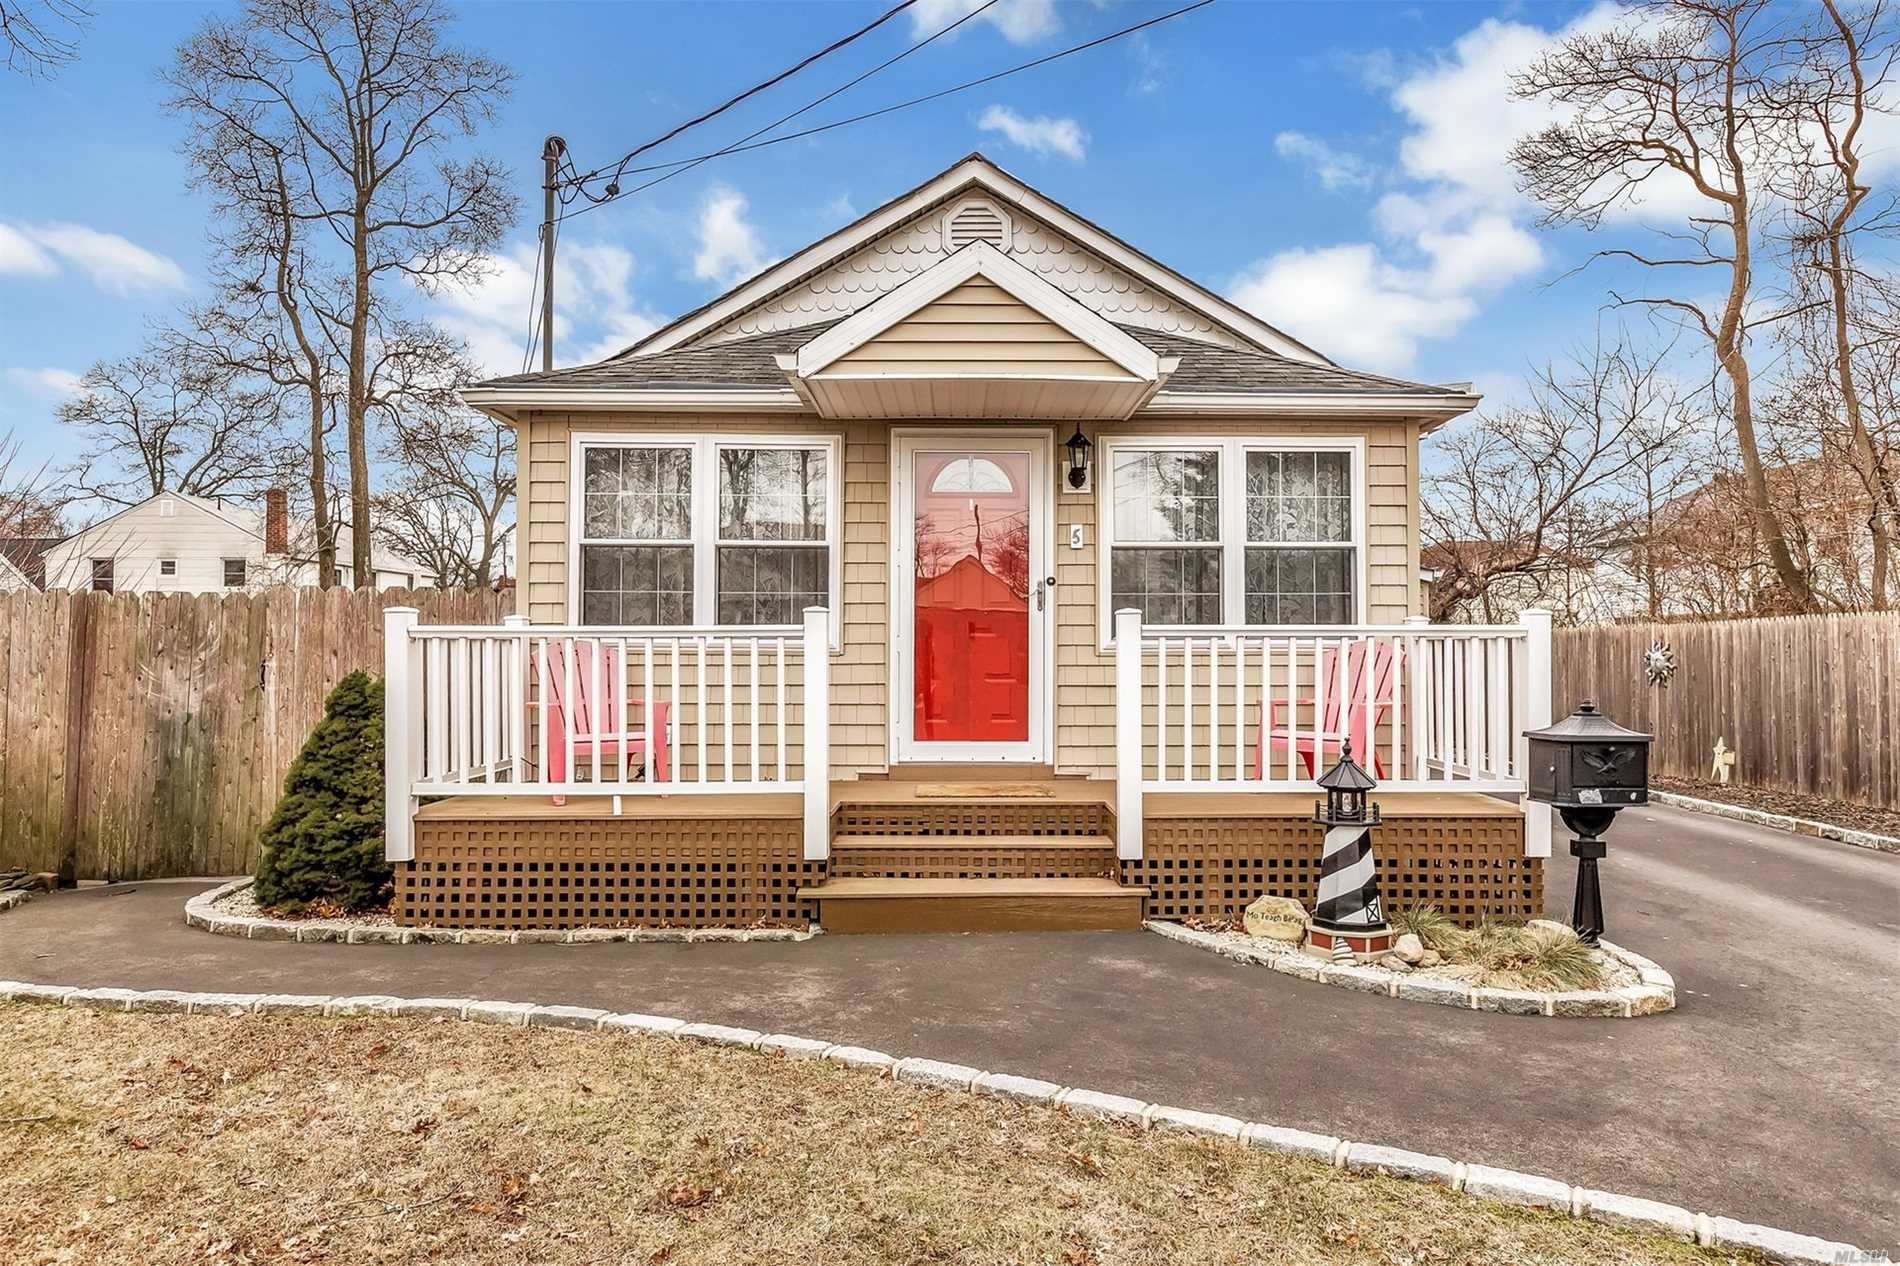 5 Catherine St - Bay Shore, New York